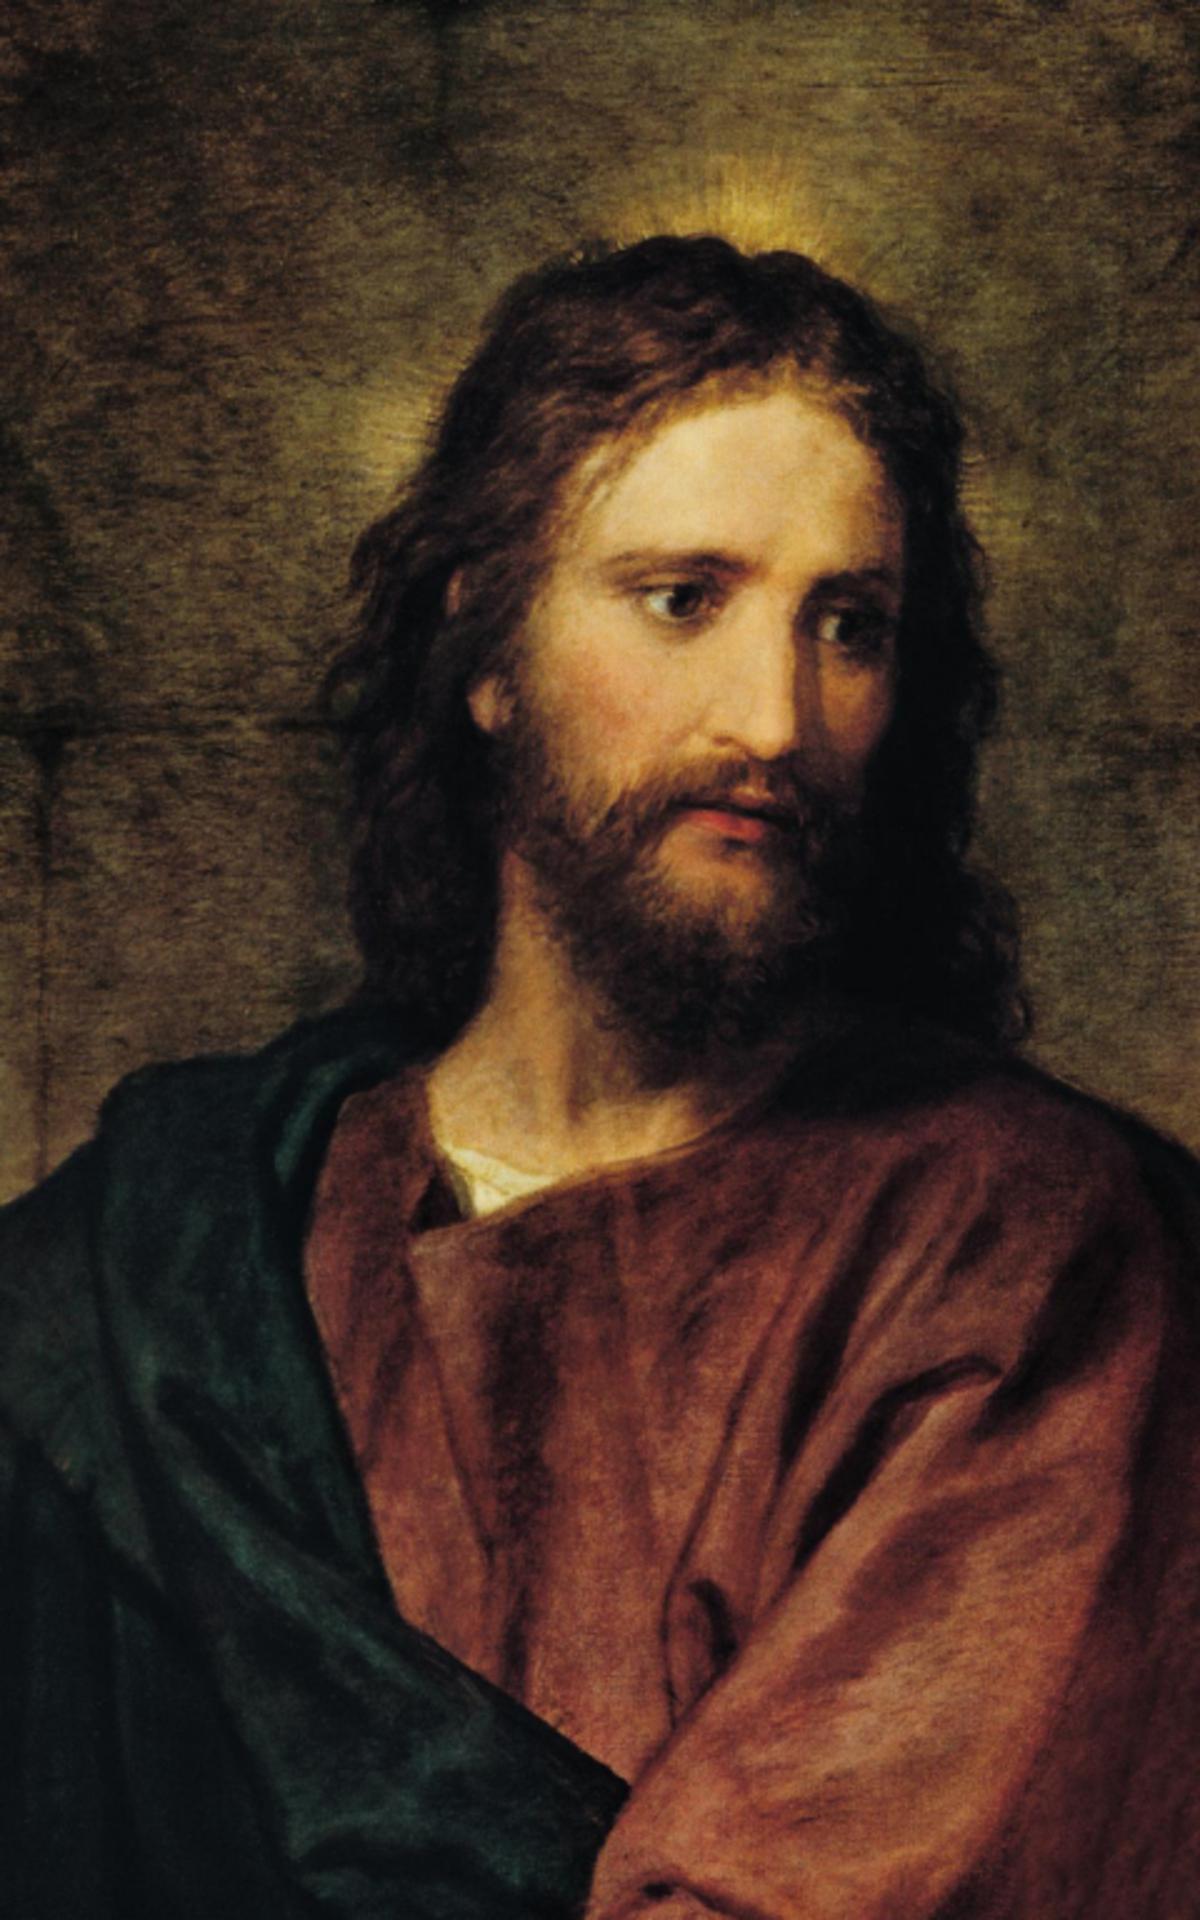 Jesus Cristo 3